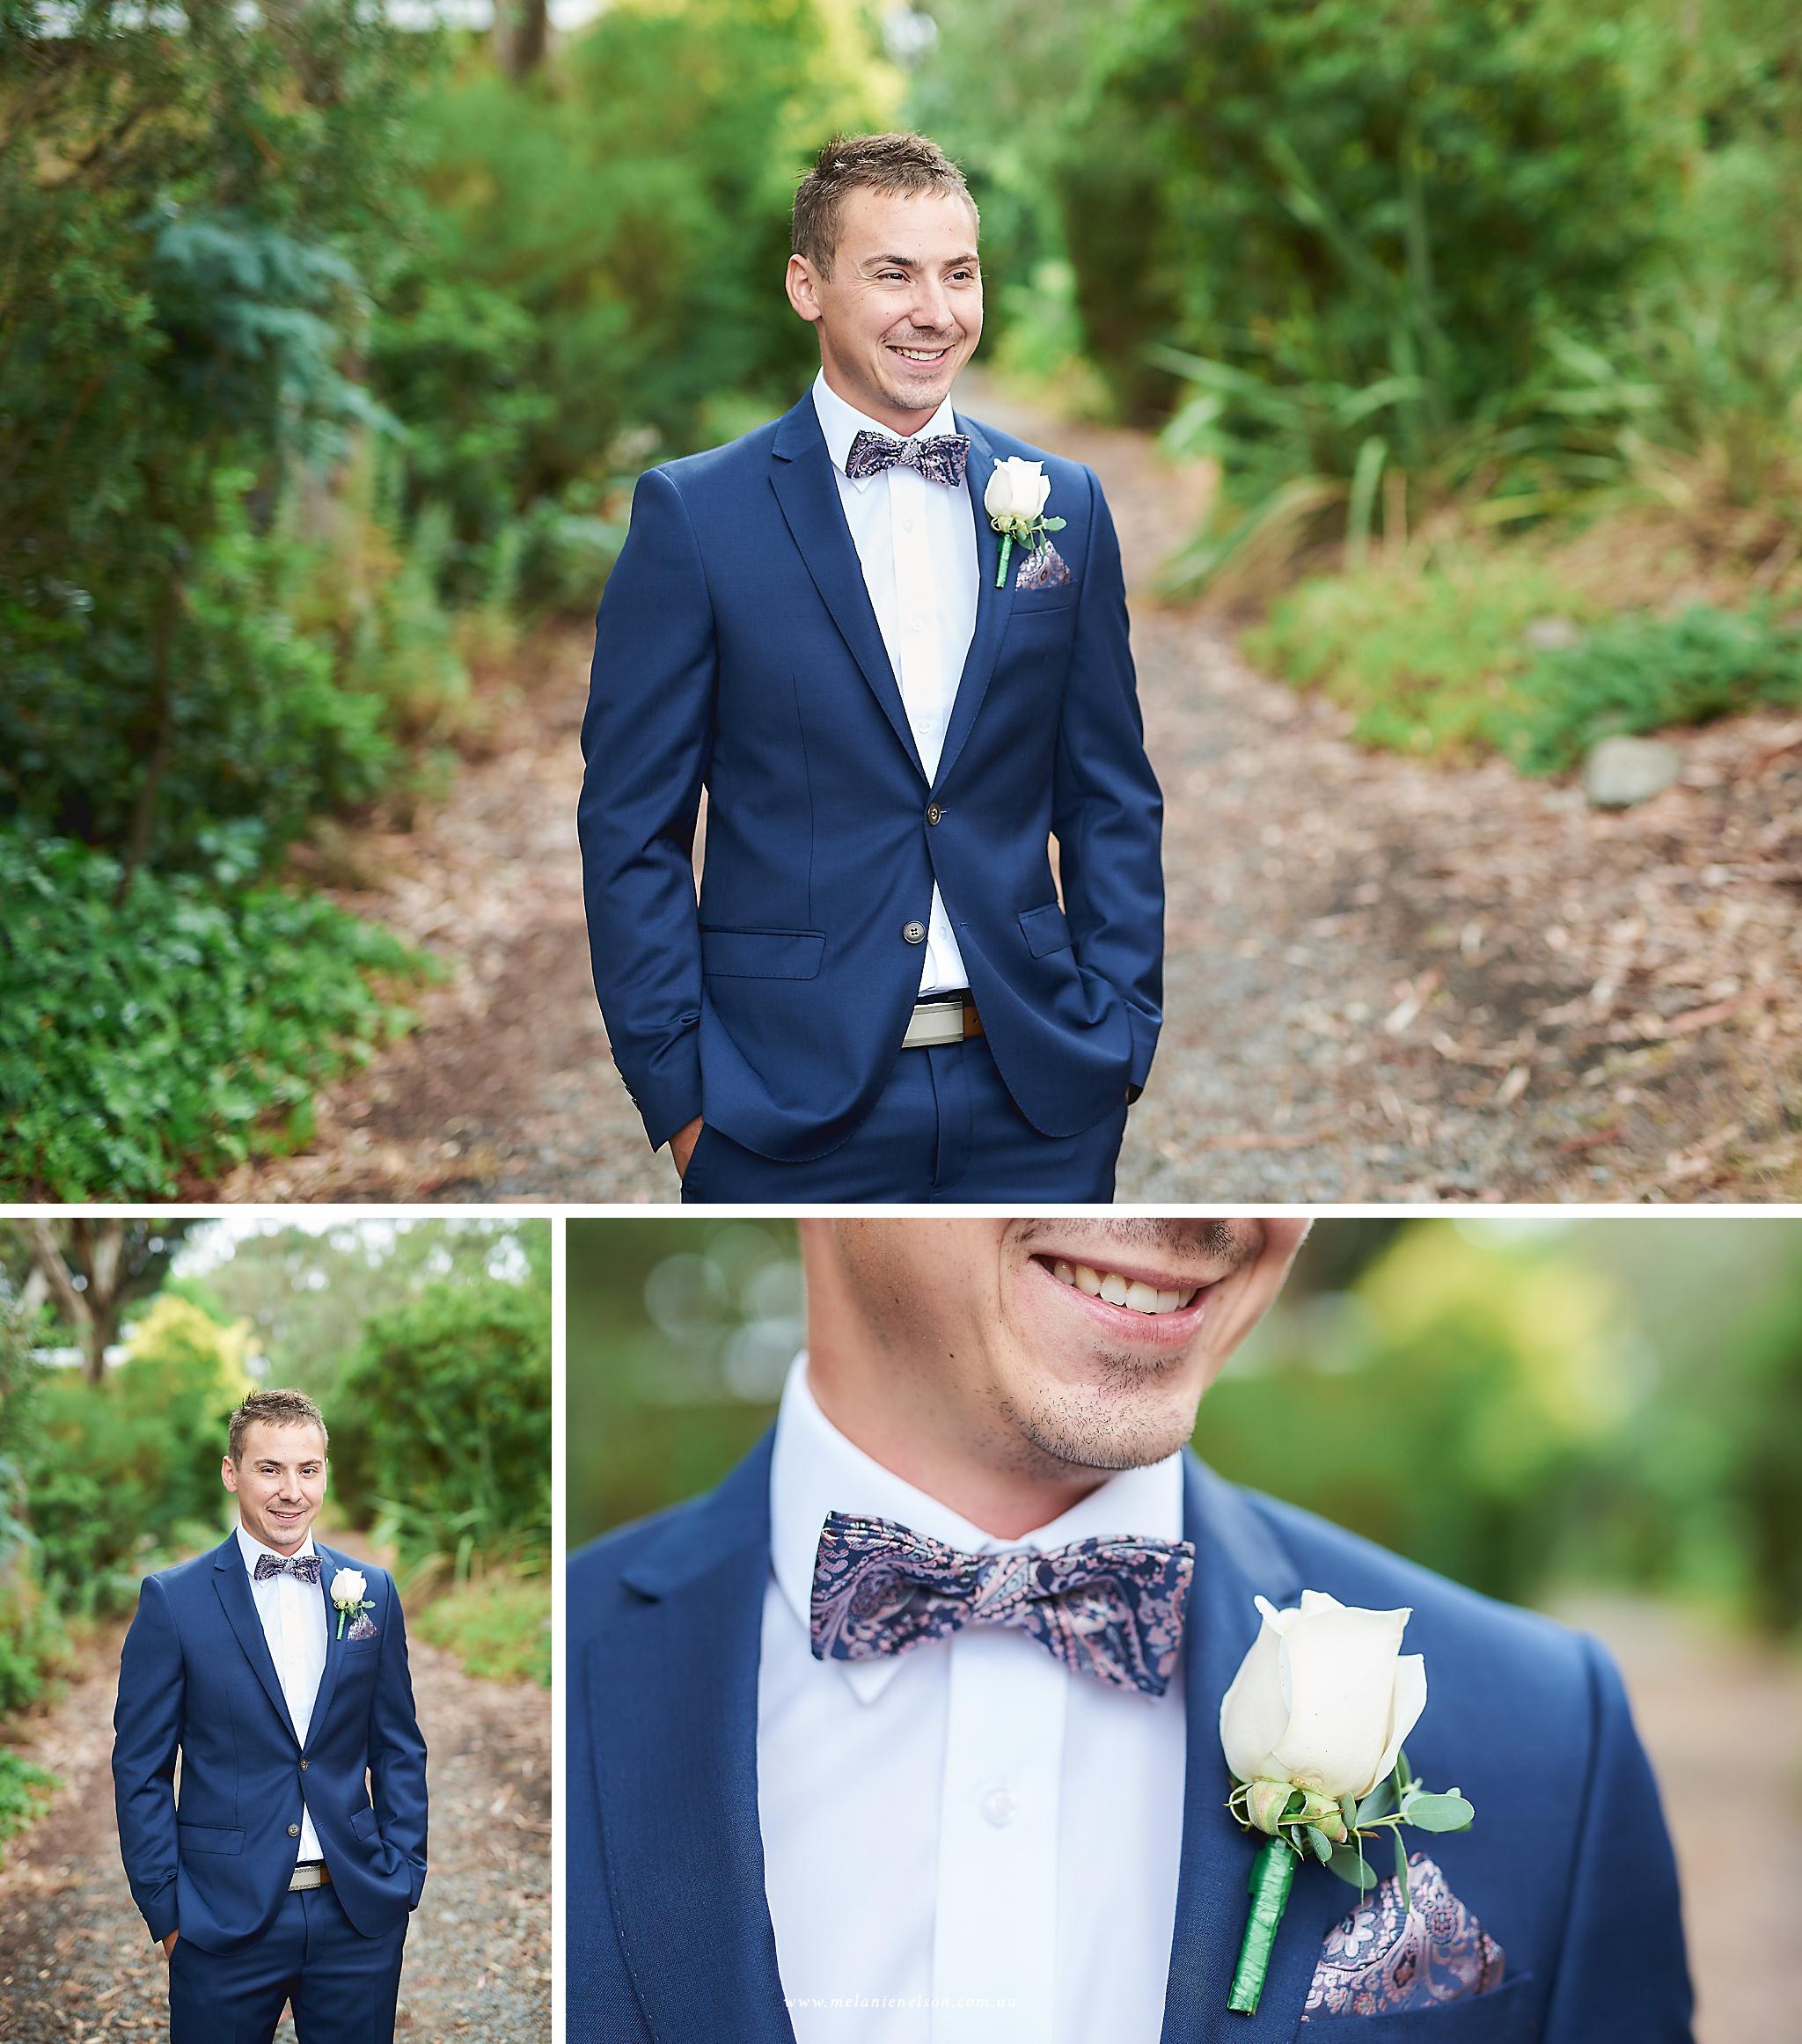 serafino_wedding_photography_0005.jpg